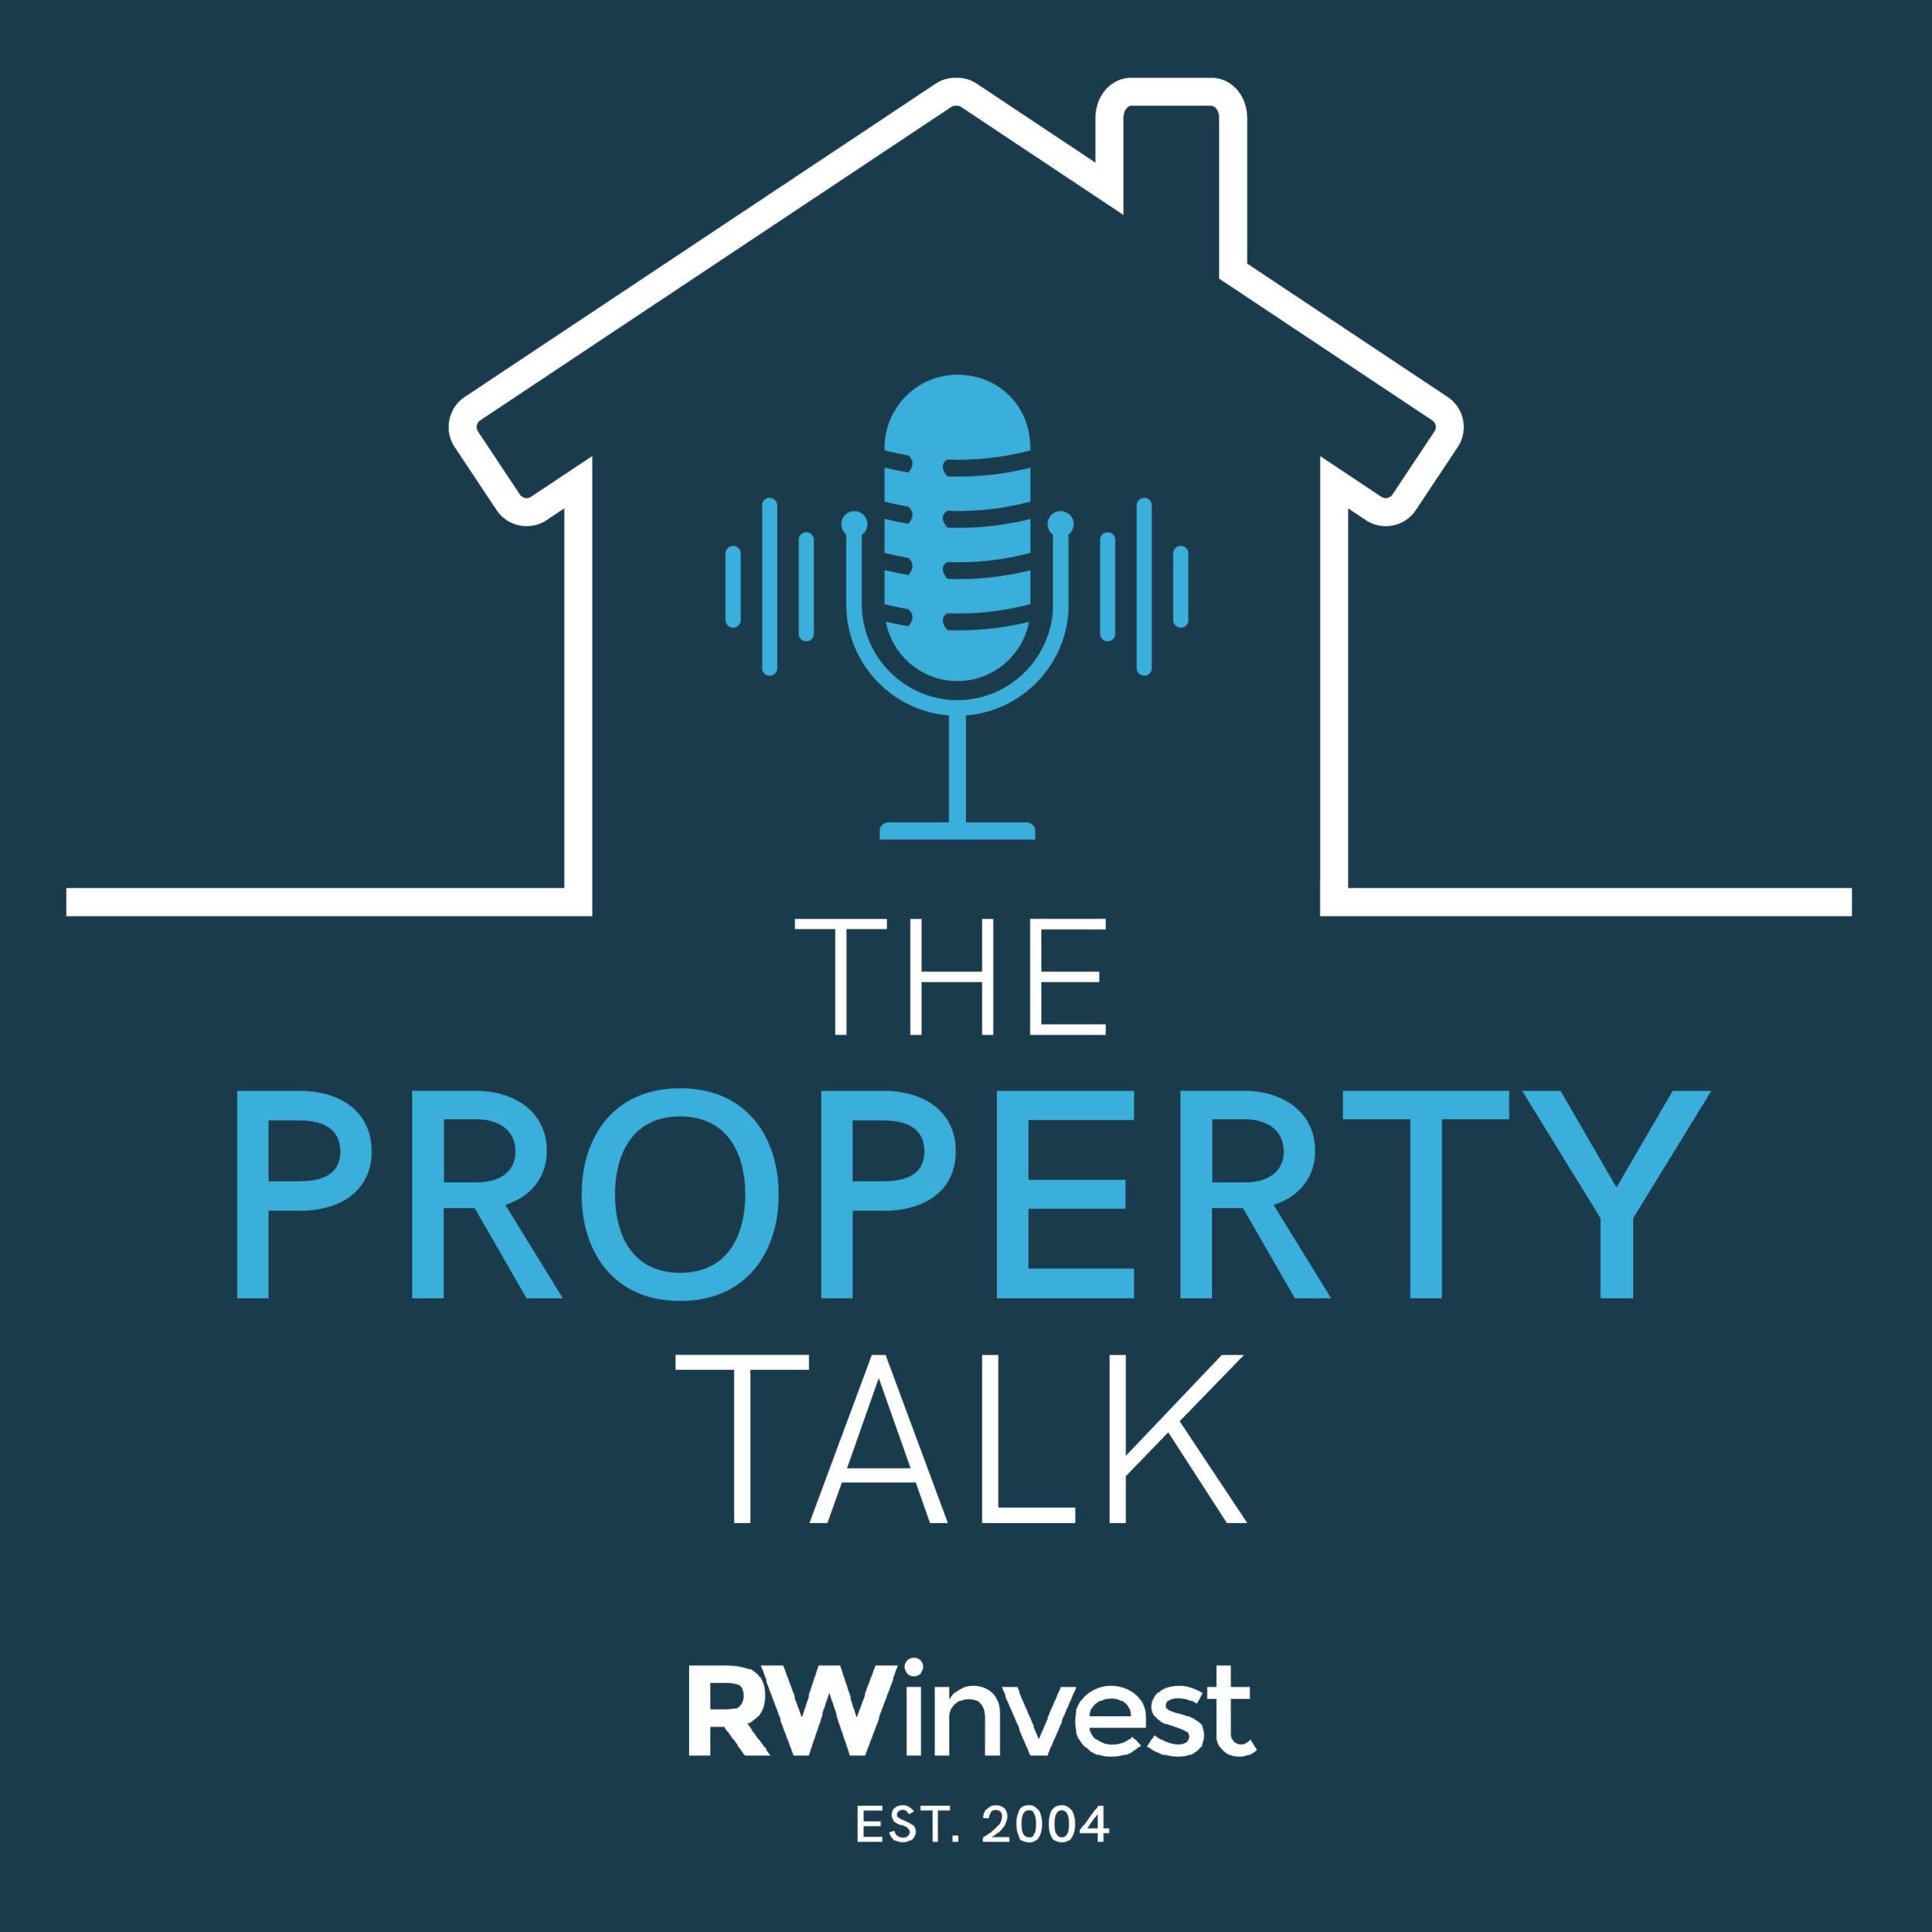 The Property Talk